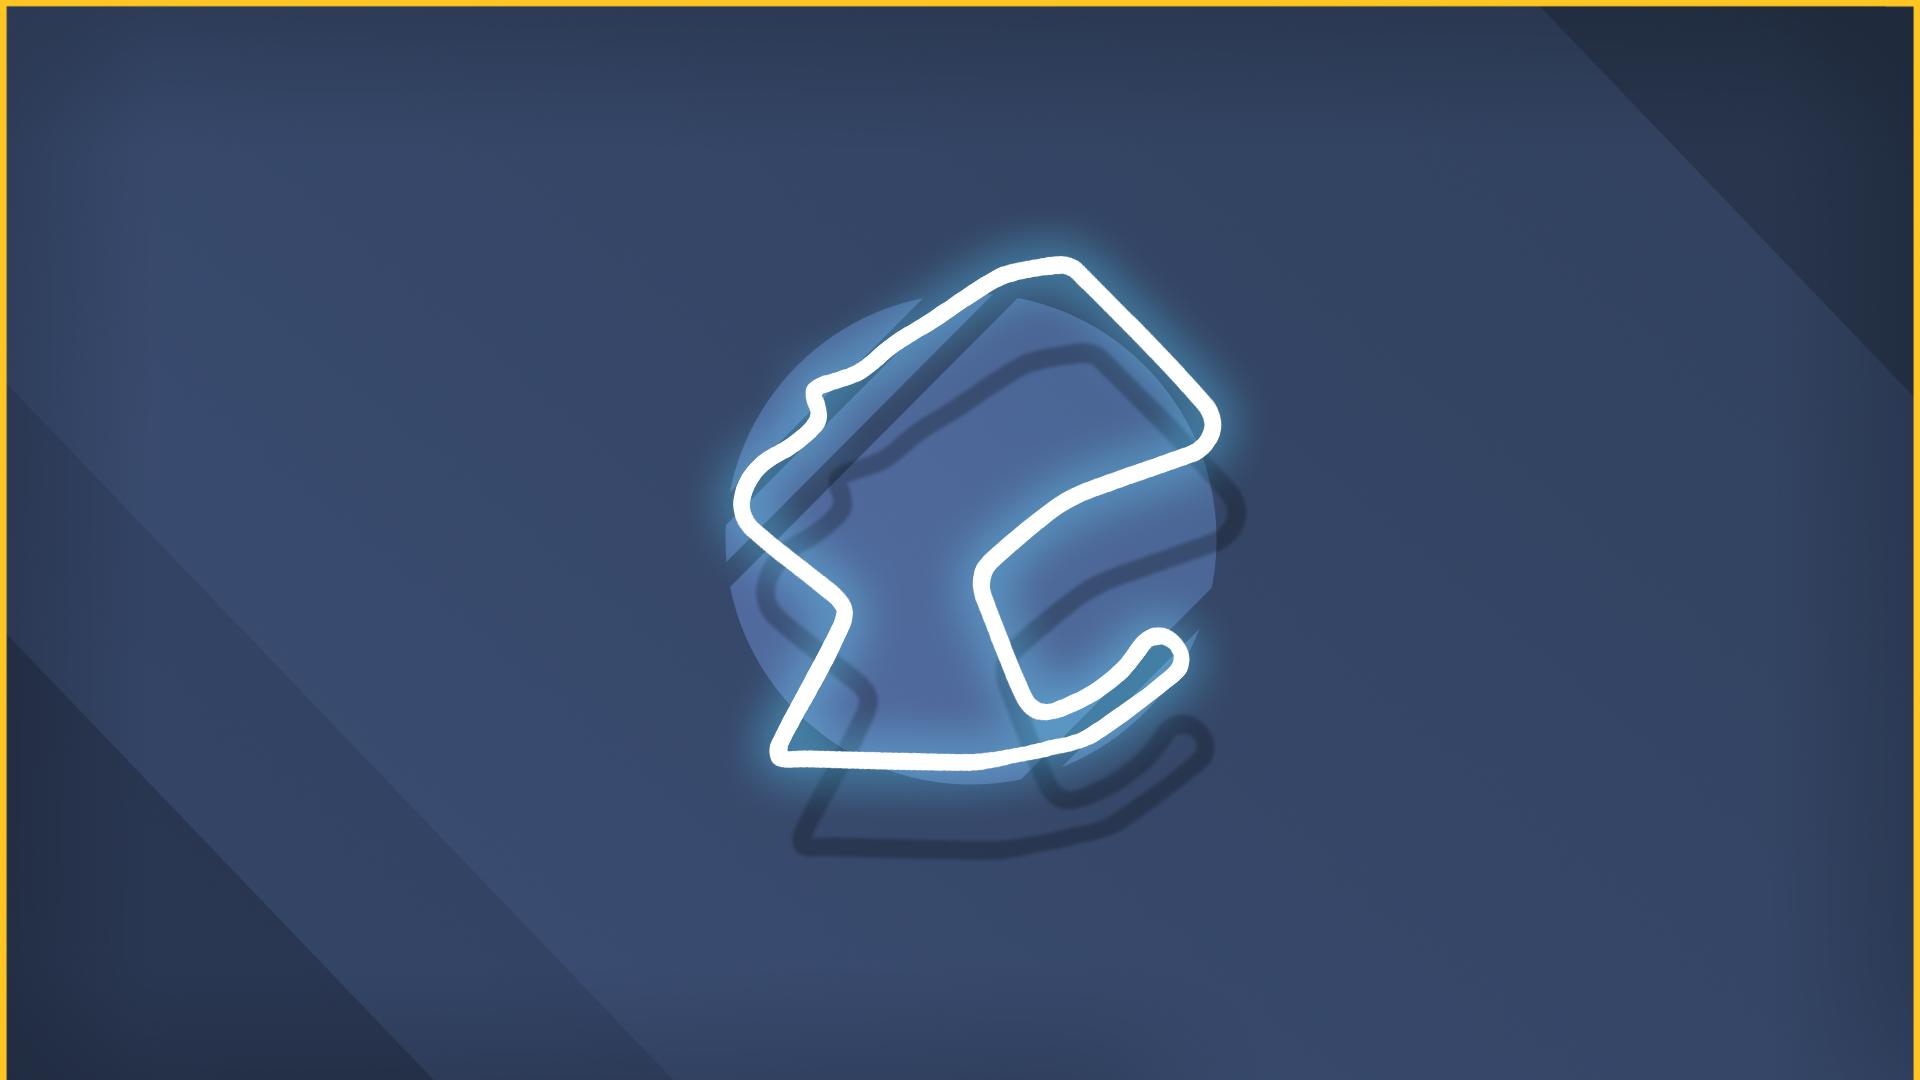 Icon for Champ of Laguna Seca